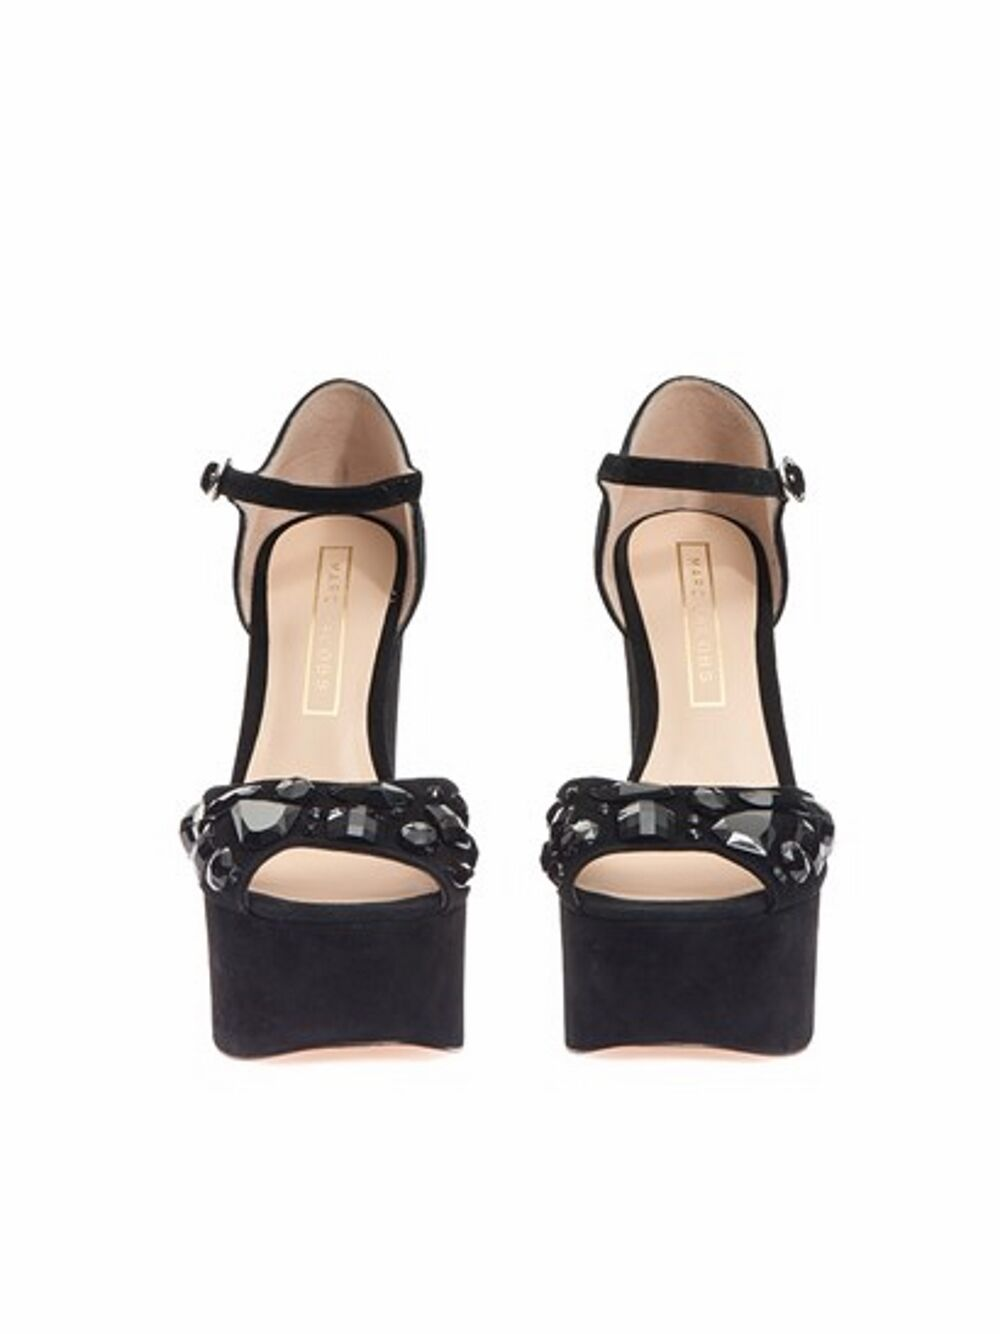 Marc Jacobs Sandalo Adriana, Adriana platform sandal